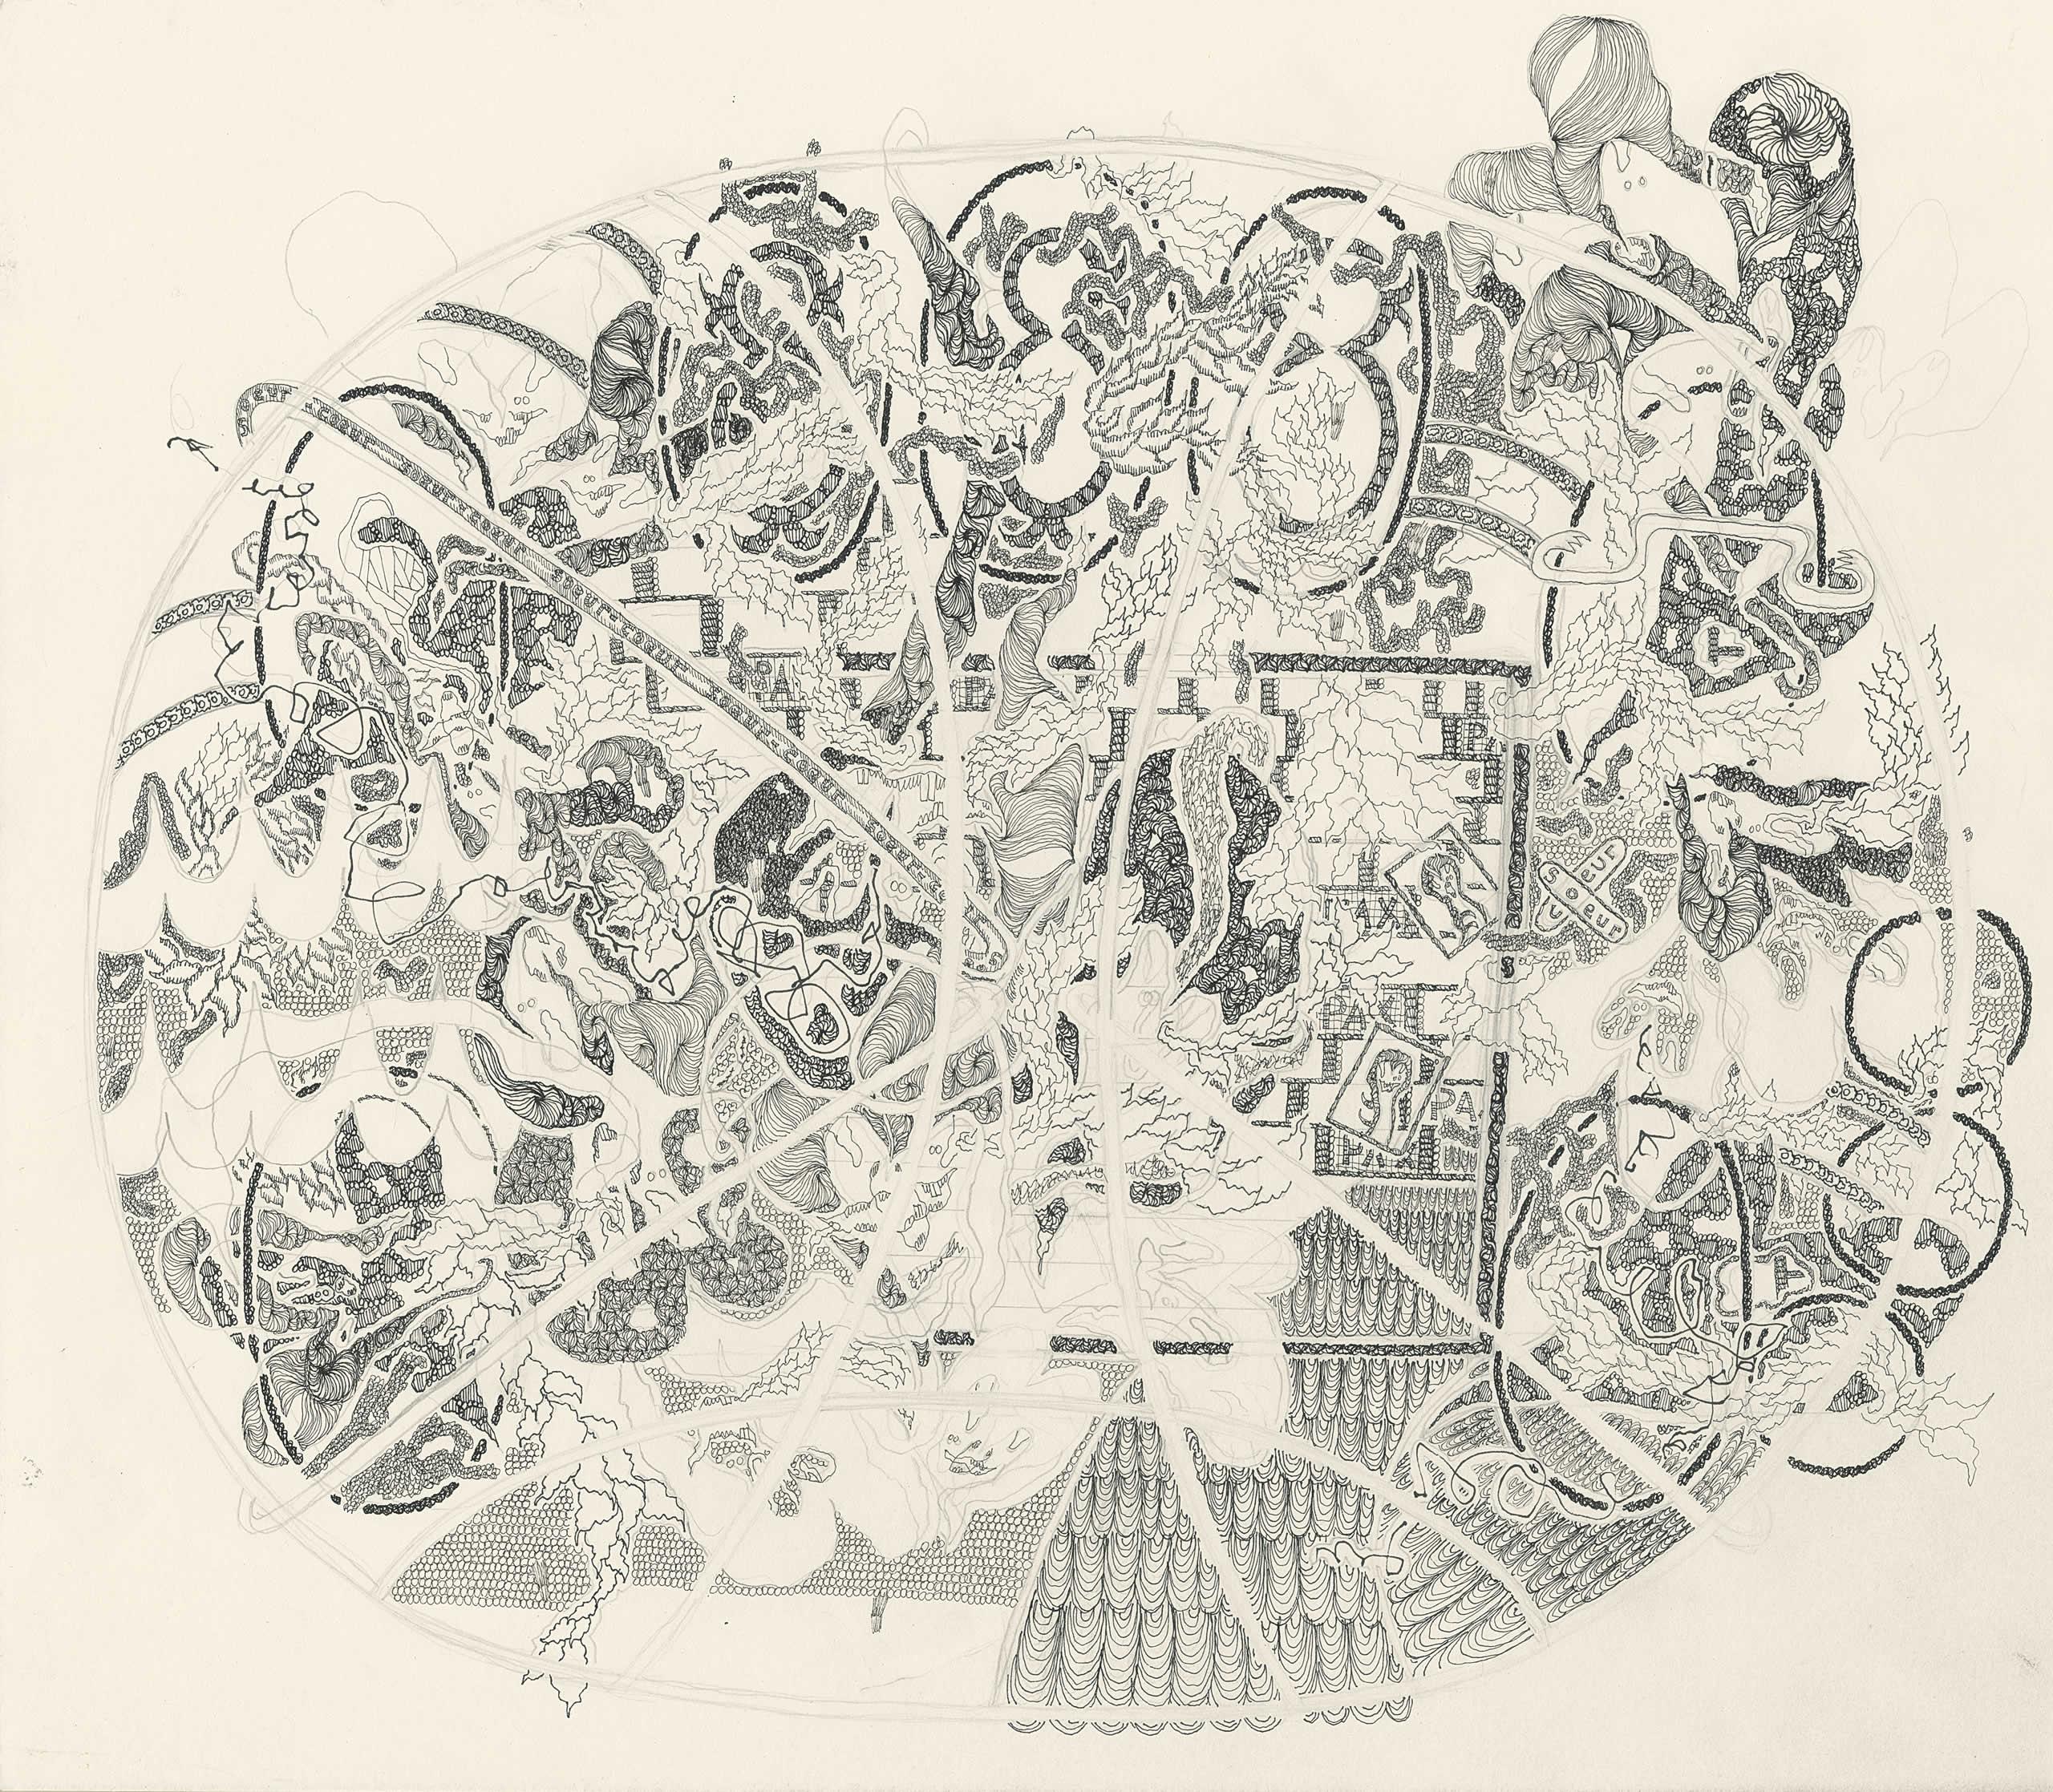 Michaela Polacek | Soeur Coeur Pax Oracel | 2019 | Bleistift und | Tuschefüller auf Papier | 39x45cm | Galerie3